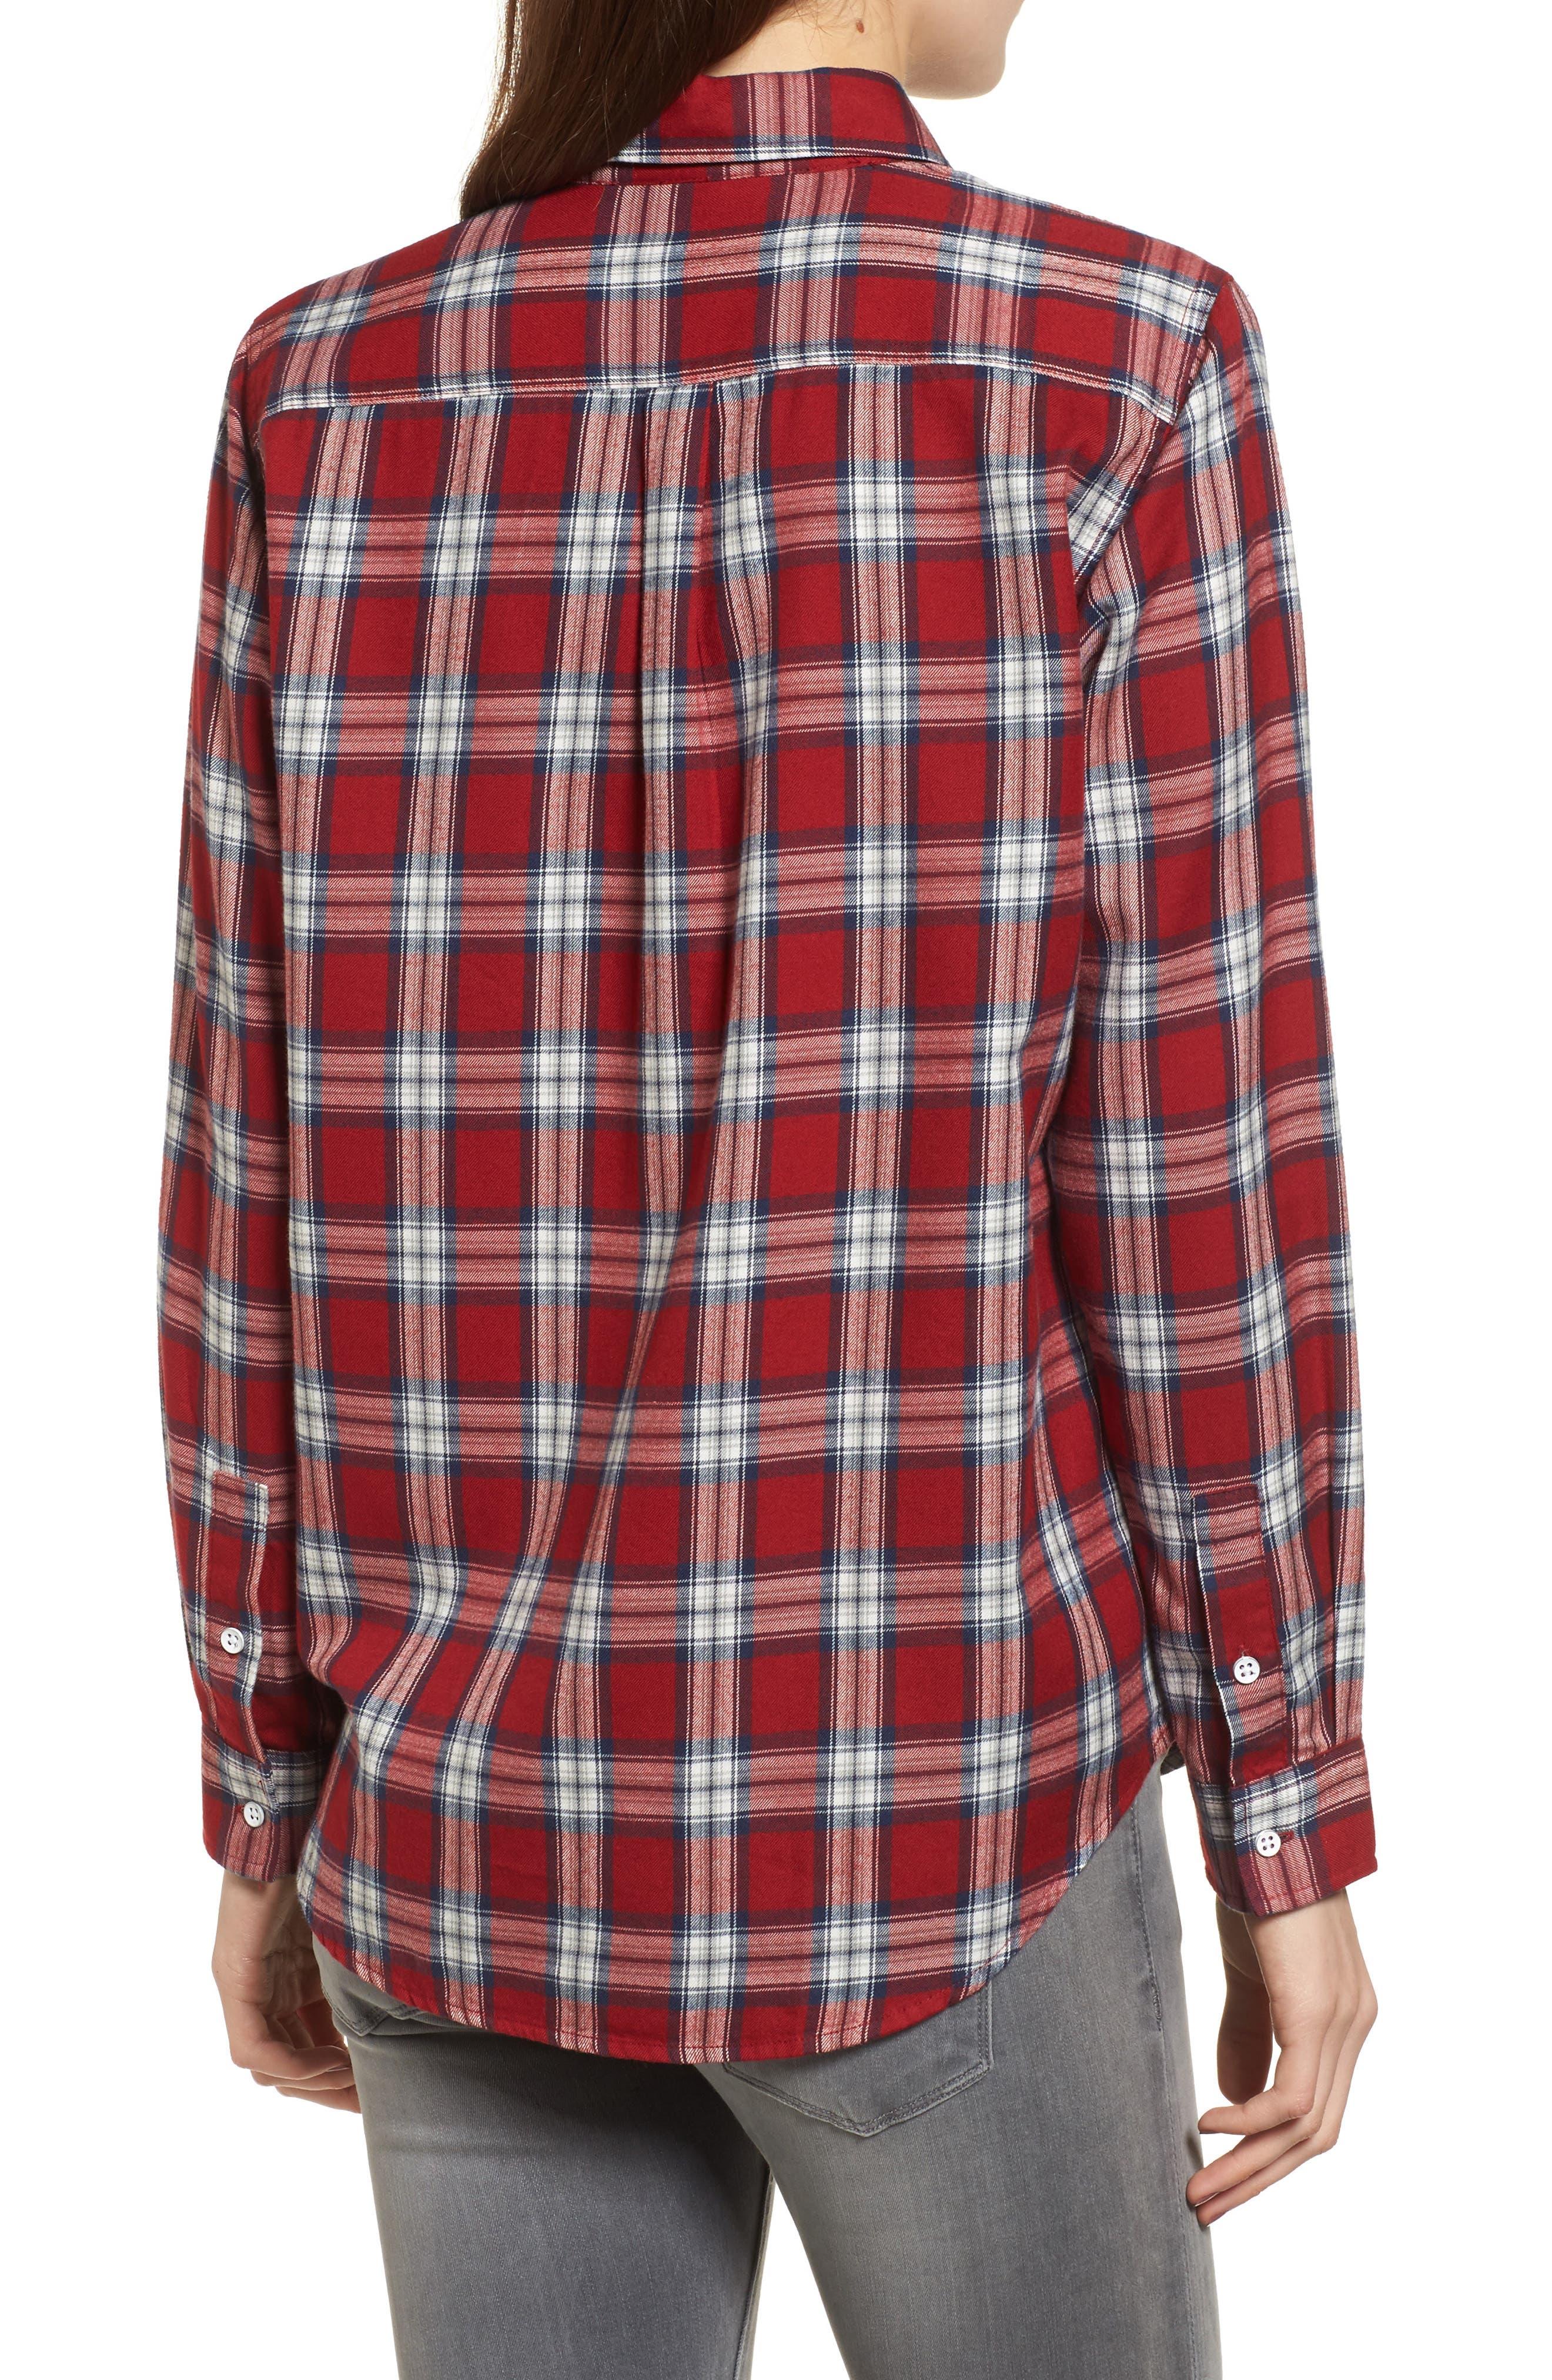 Mercer & Spring Plaid Shirt,                             Alternate thumbnail 2, color,                             Red Plaid